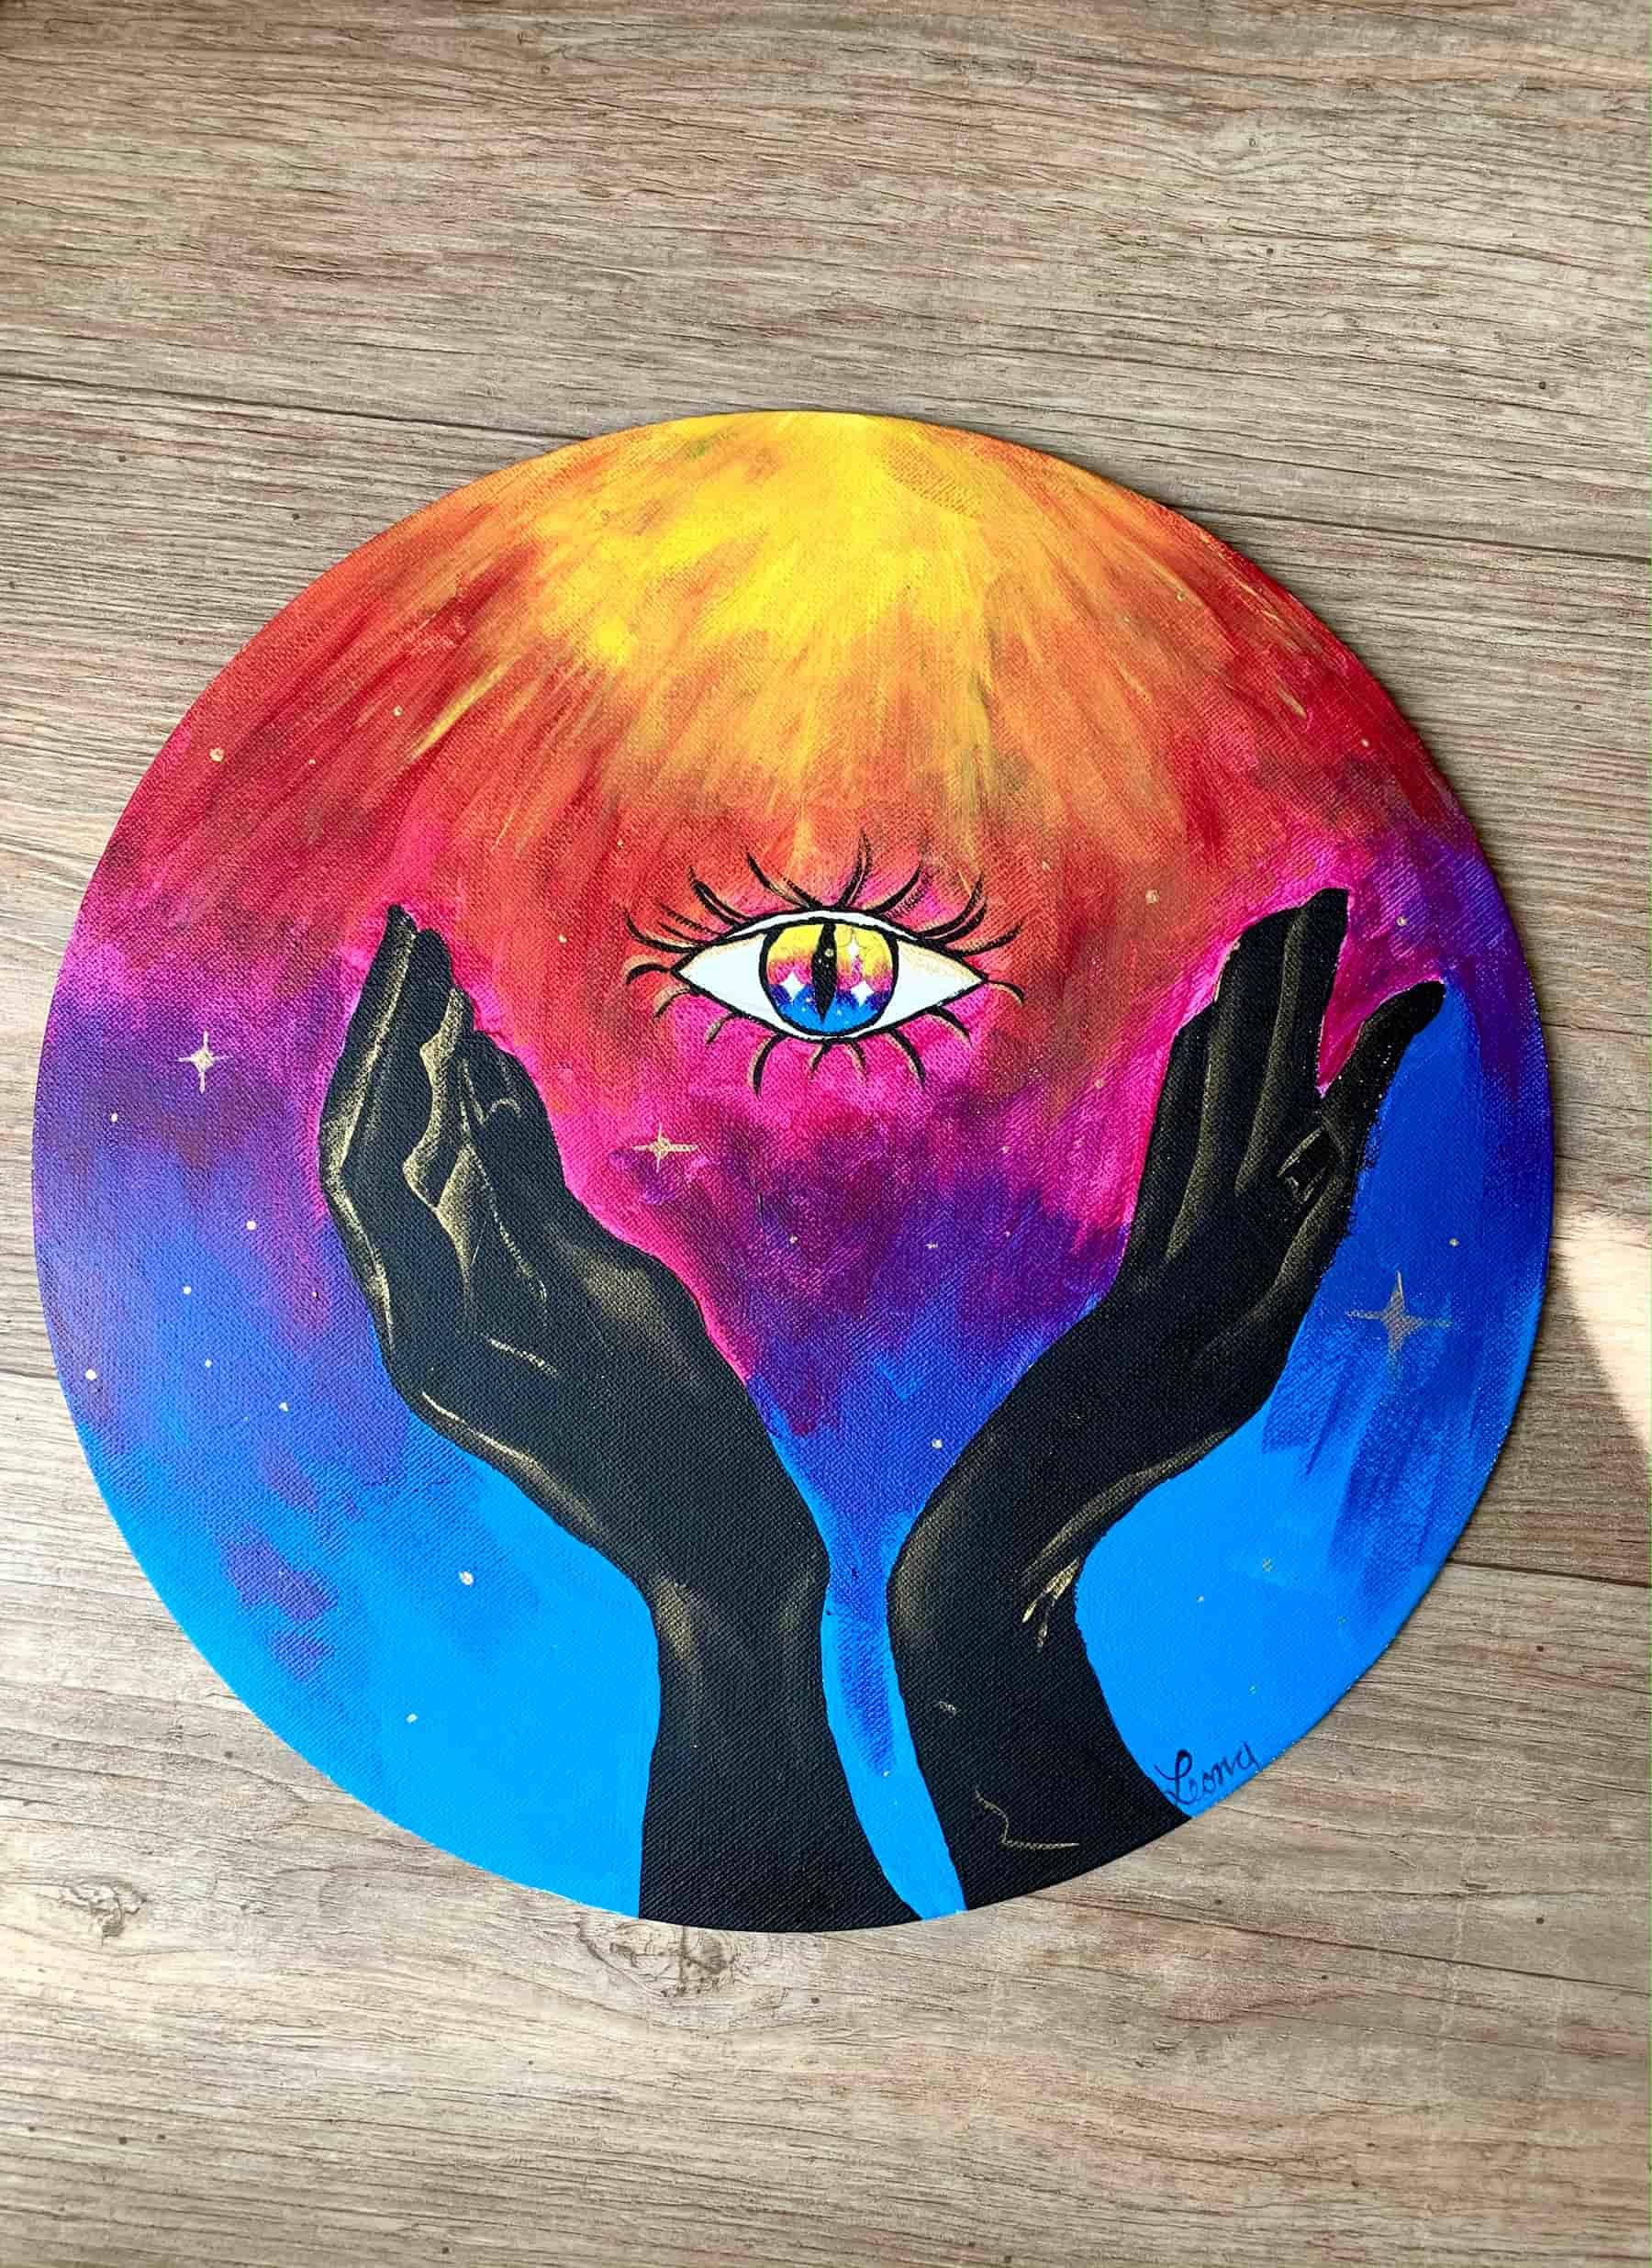 The sun; 2021; 30cm Durchmesser; Acryl auf Leinwand